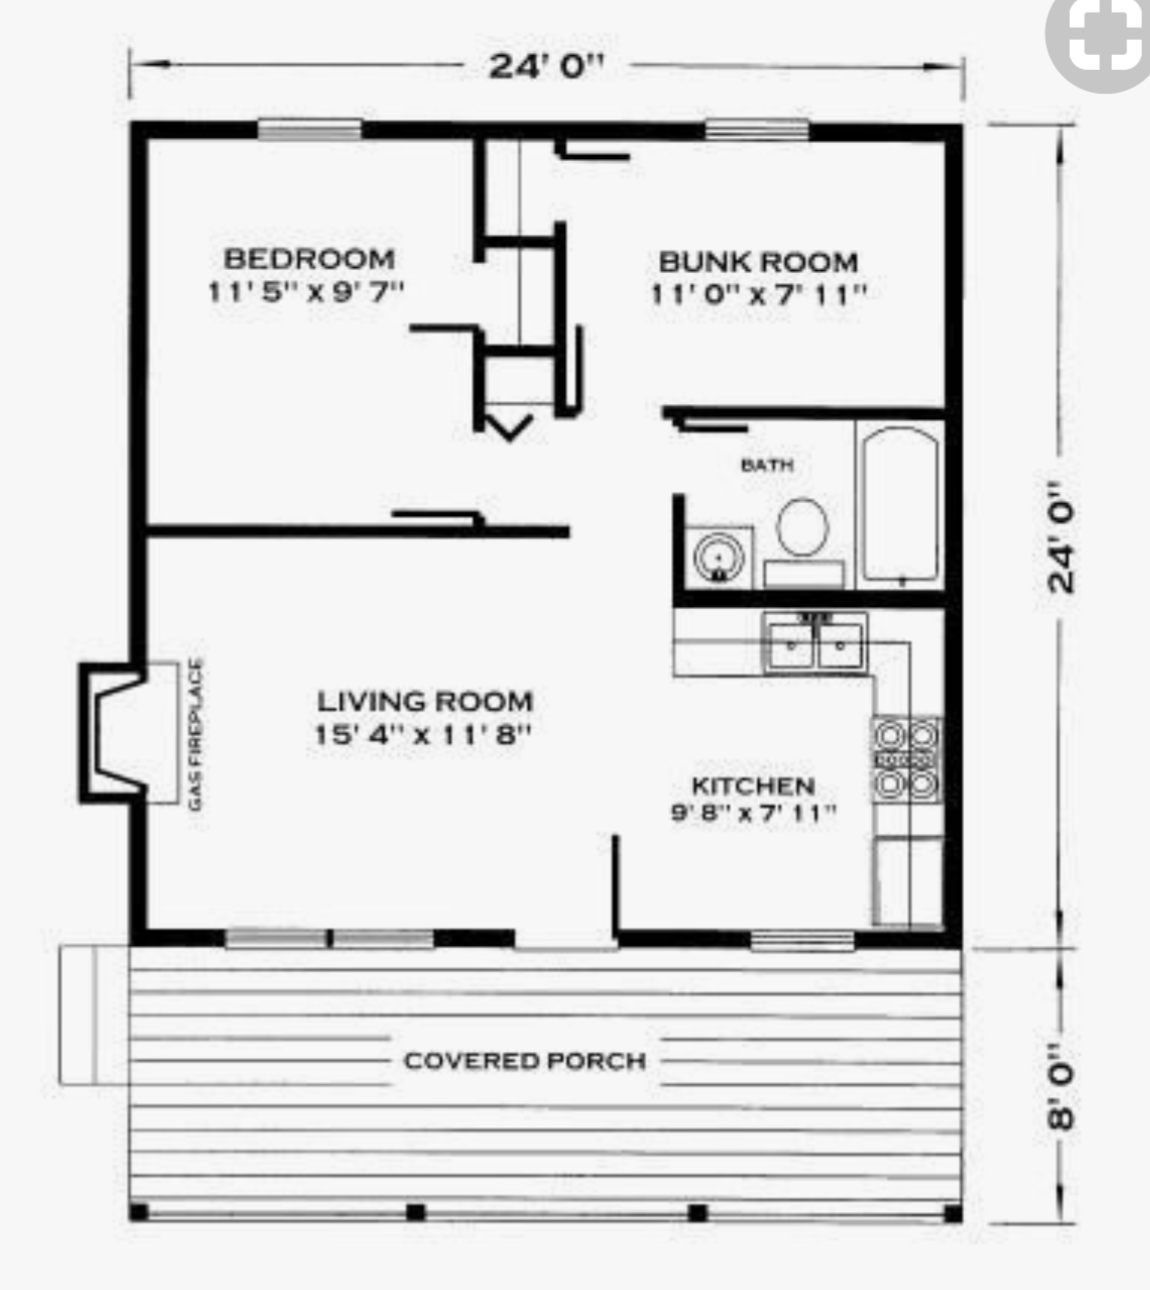 24x24 Simple Plan Https Www Youtube Com Channel Ucxpj8hxf Jcir49vdaecjkg Videos Cabin Floor Plans Cabin Floor House Plans